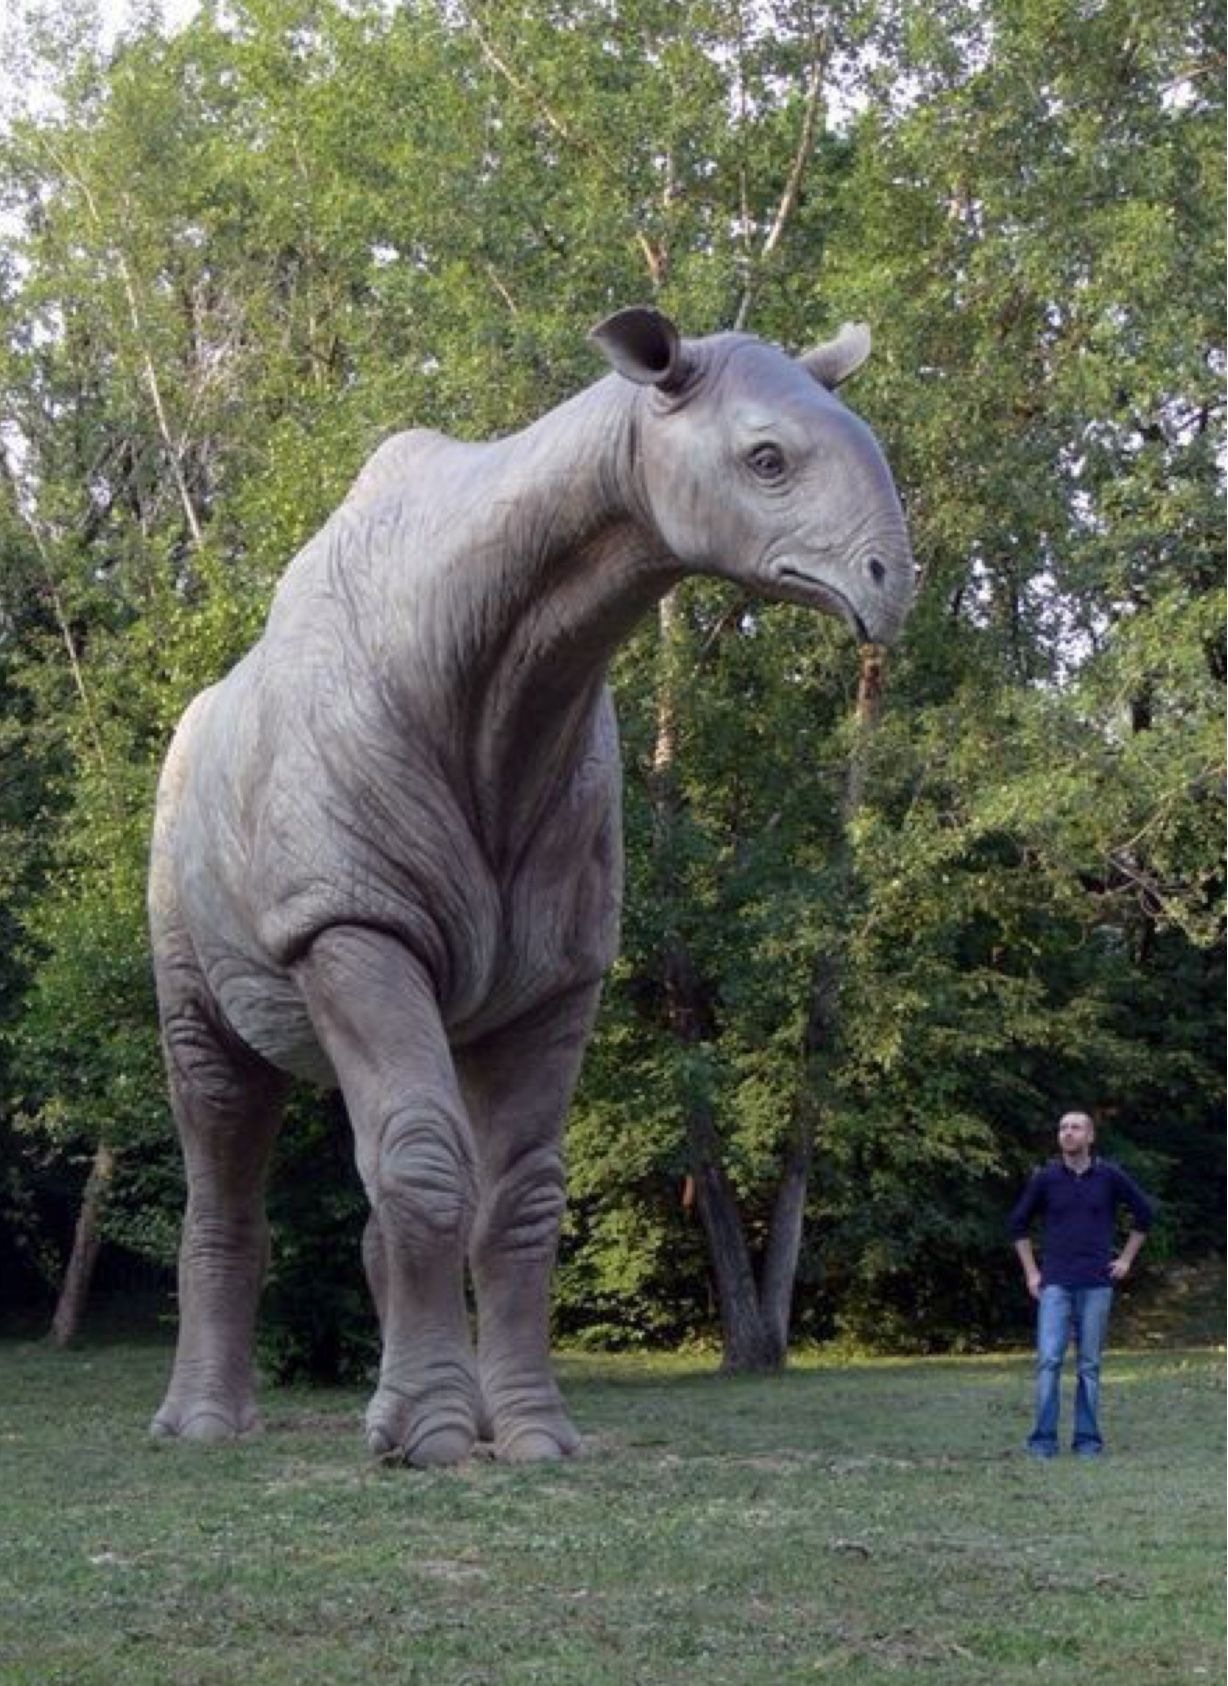 Pin on Bones (Dinosaurs, Fossils & Extinct Creatures)